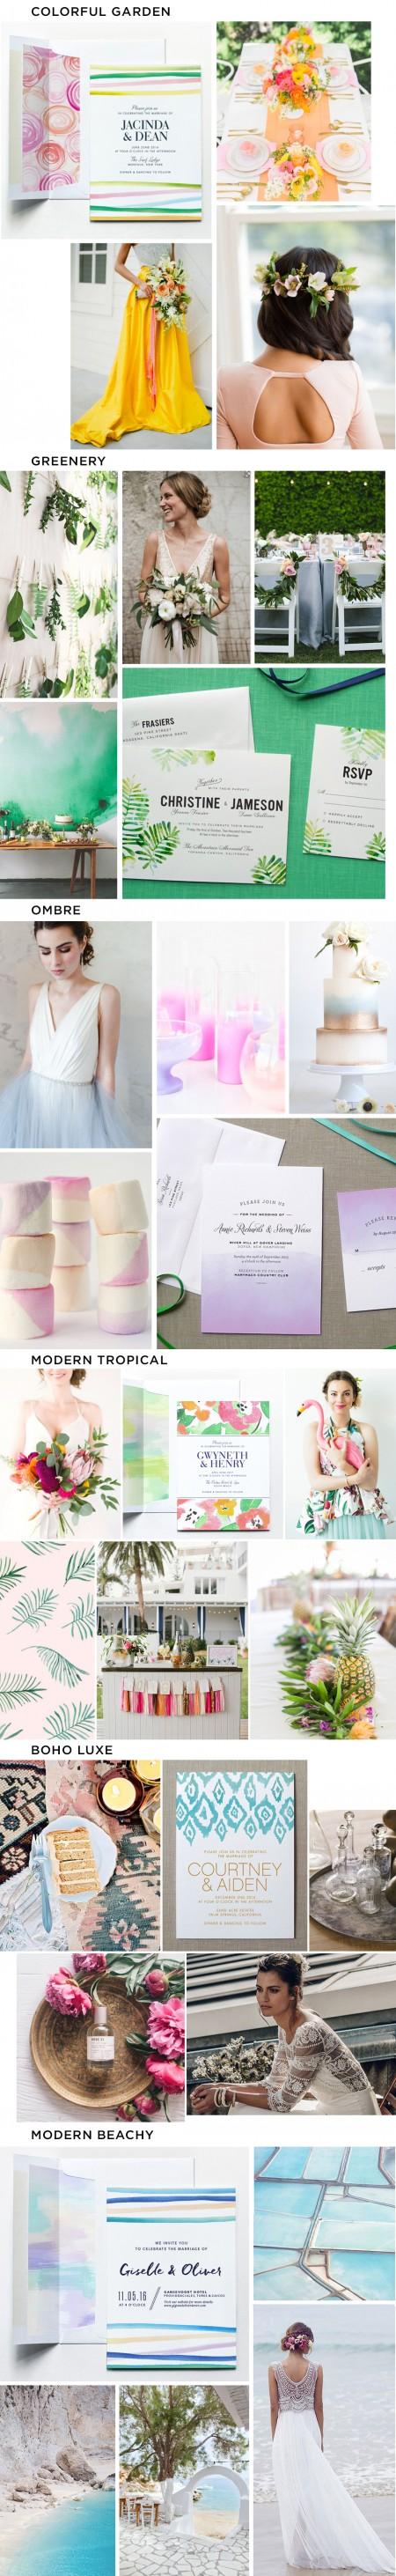 Wedding Inspiration Boards